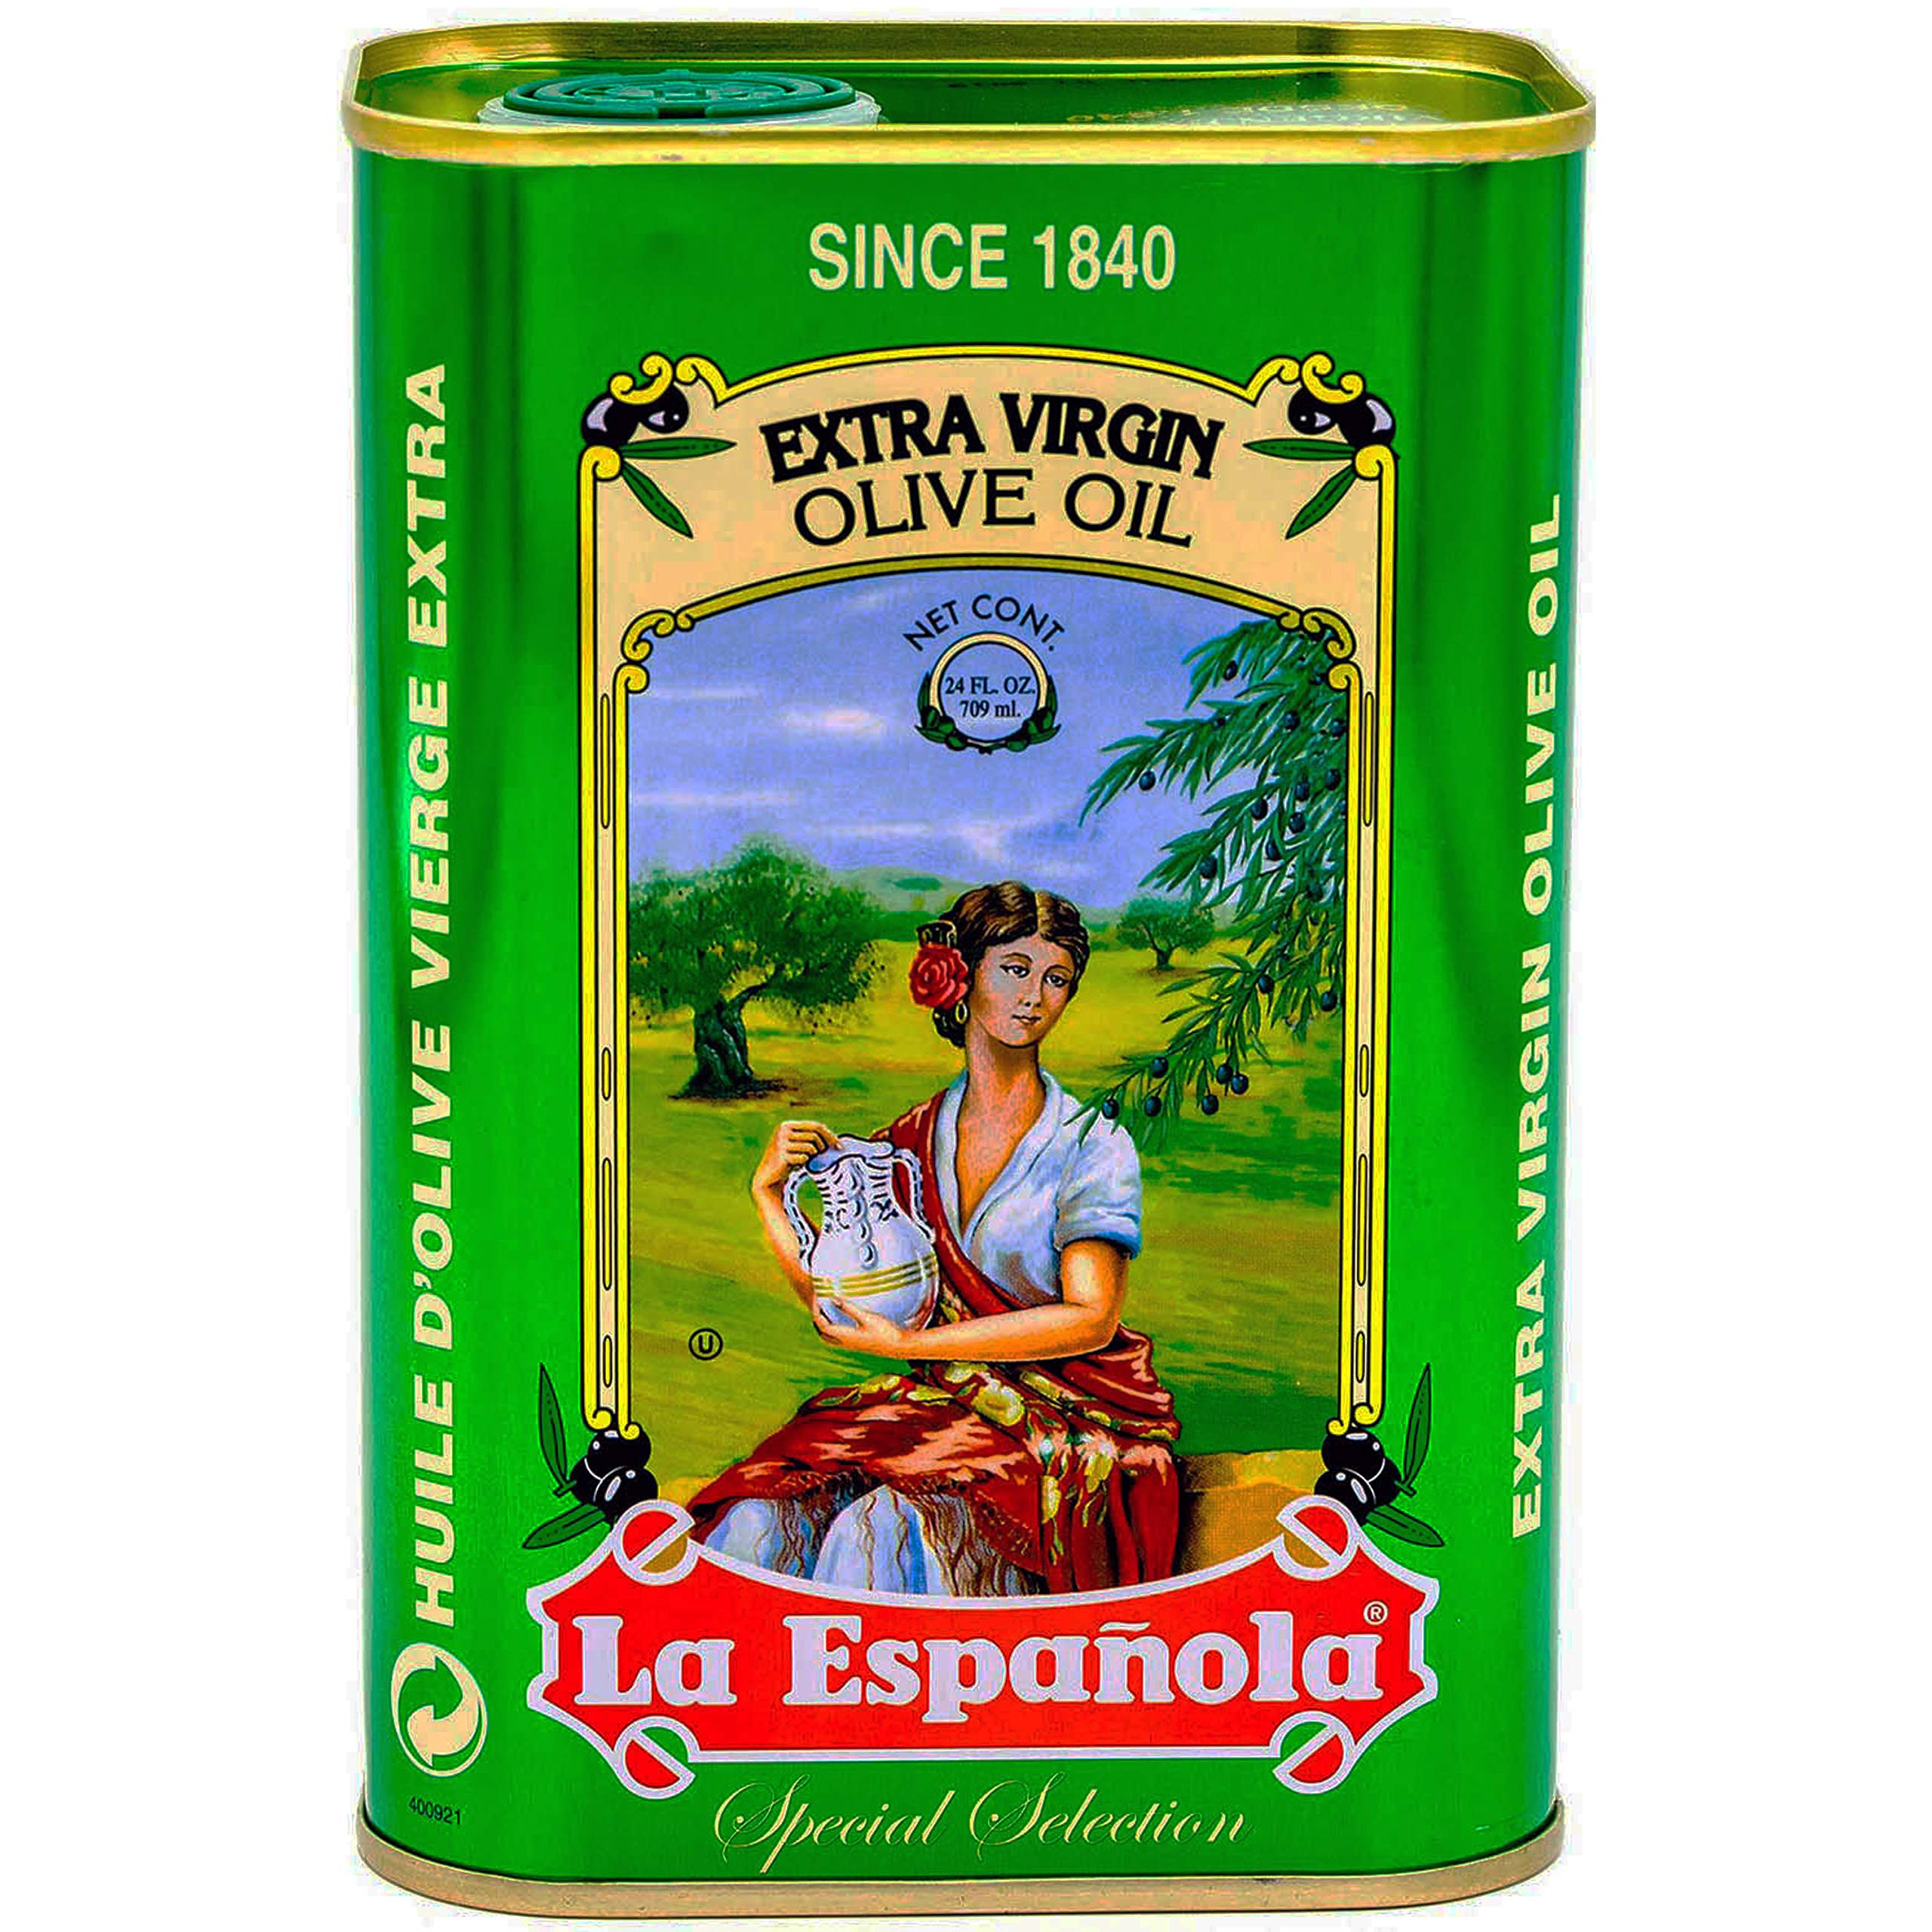 La Española Extra Virgin Olive Oil, 24 fl oz, 100% Extra Virgin Olive Oil, First Cold Pressed from Extra Virgin Olives, Best Olive Oil from Spain in Beautiful Tin by La Española